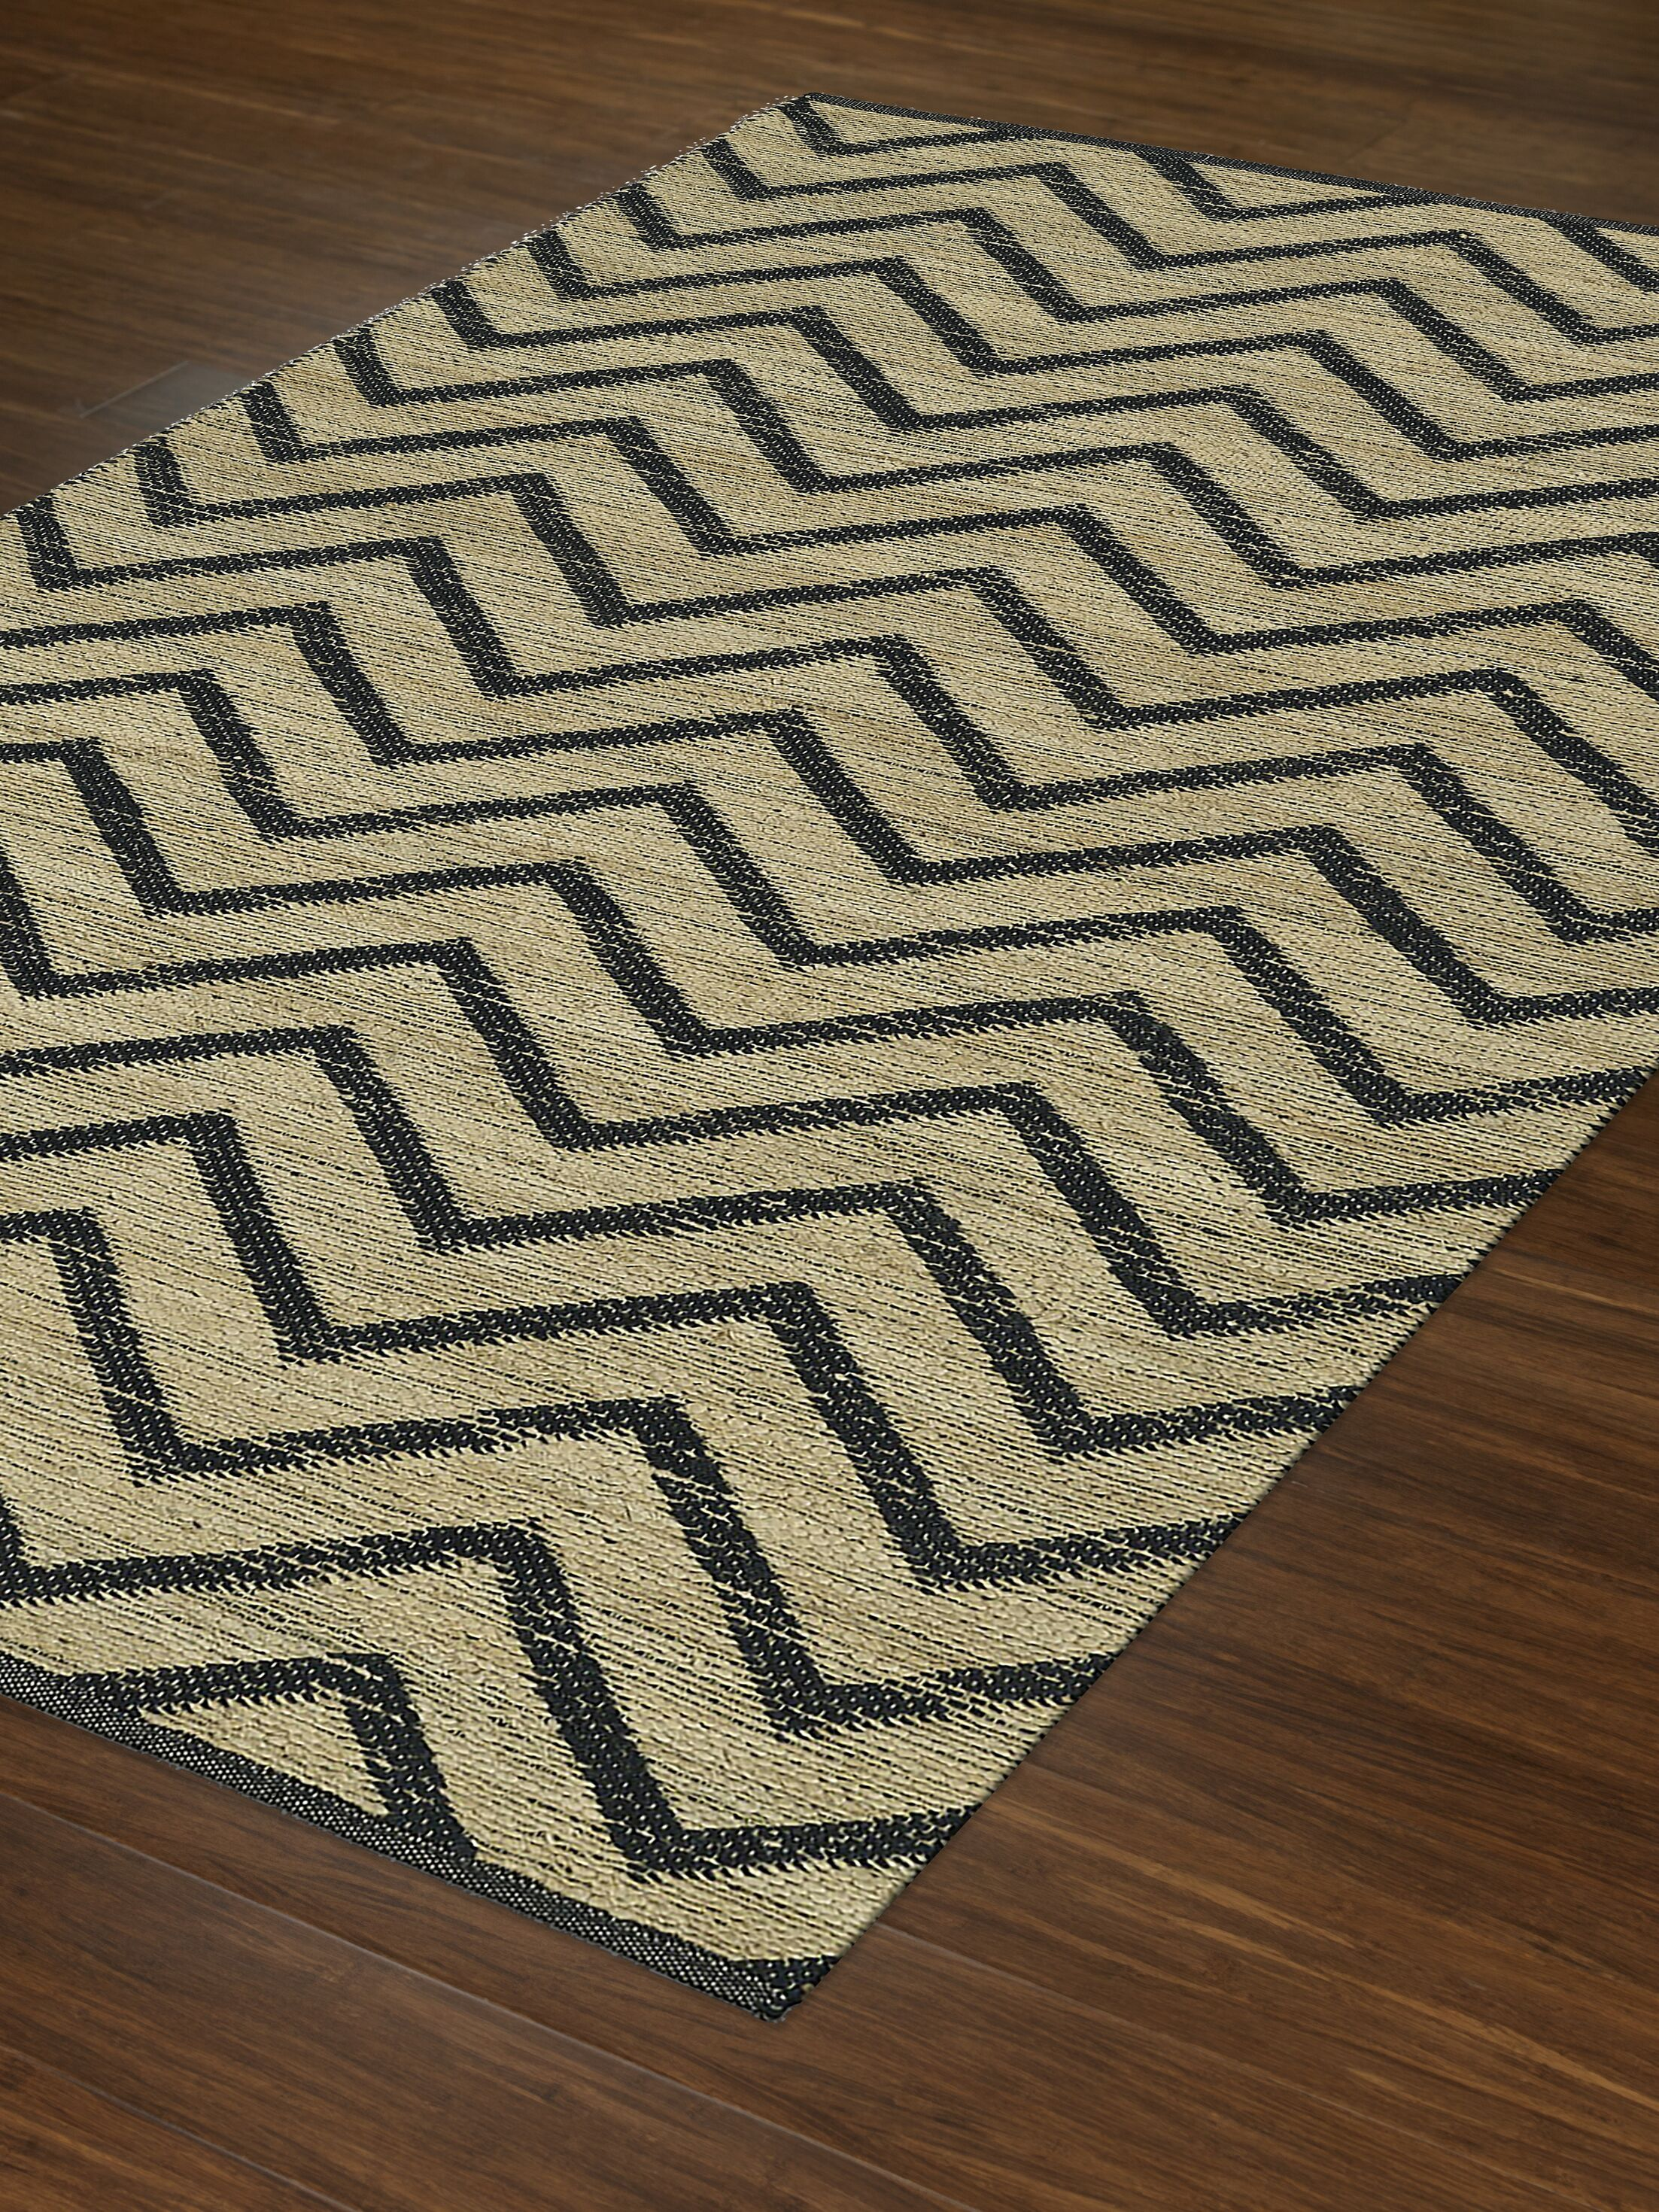 Santiago Dalyn Black Area Rug Rug Size: Rectangle 5' x 7'6